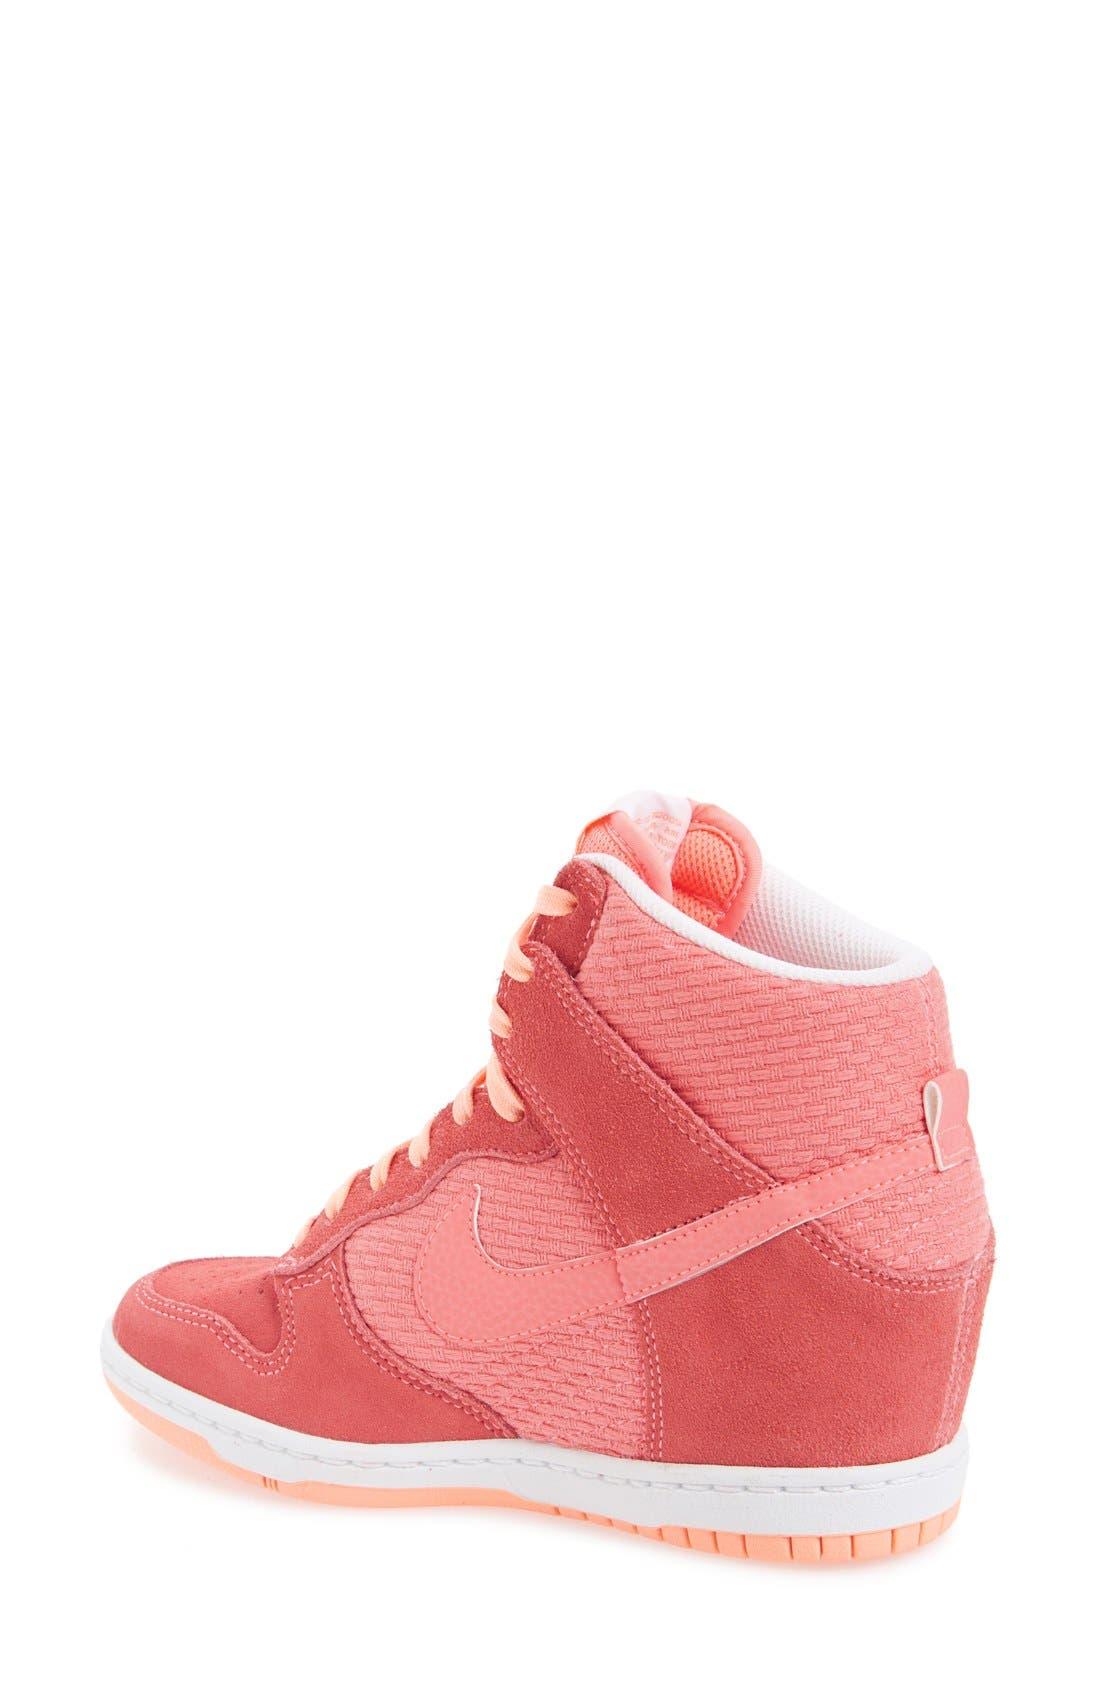 ,                             'Dunk Sky Hi - Essential' Wedge Sneaker,                             Alternate thumbnail 60, color,                             602